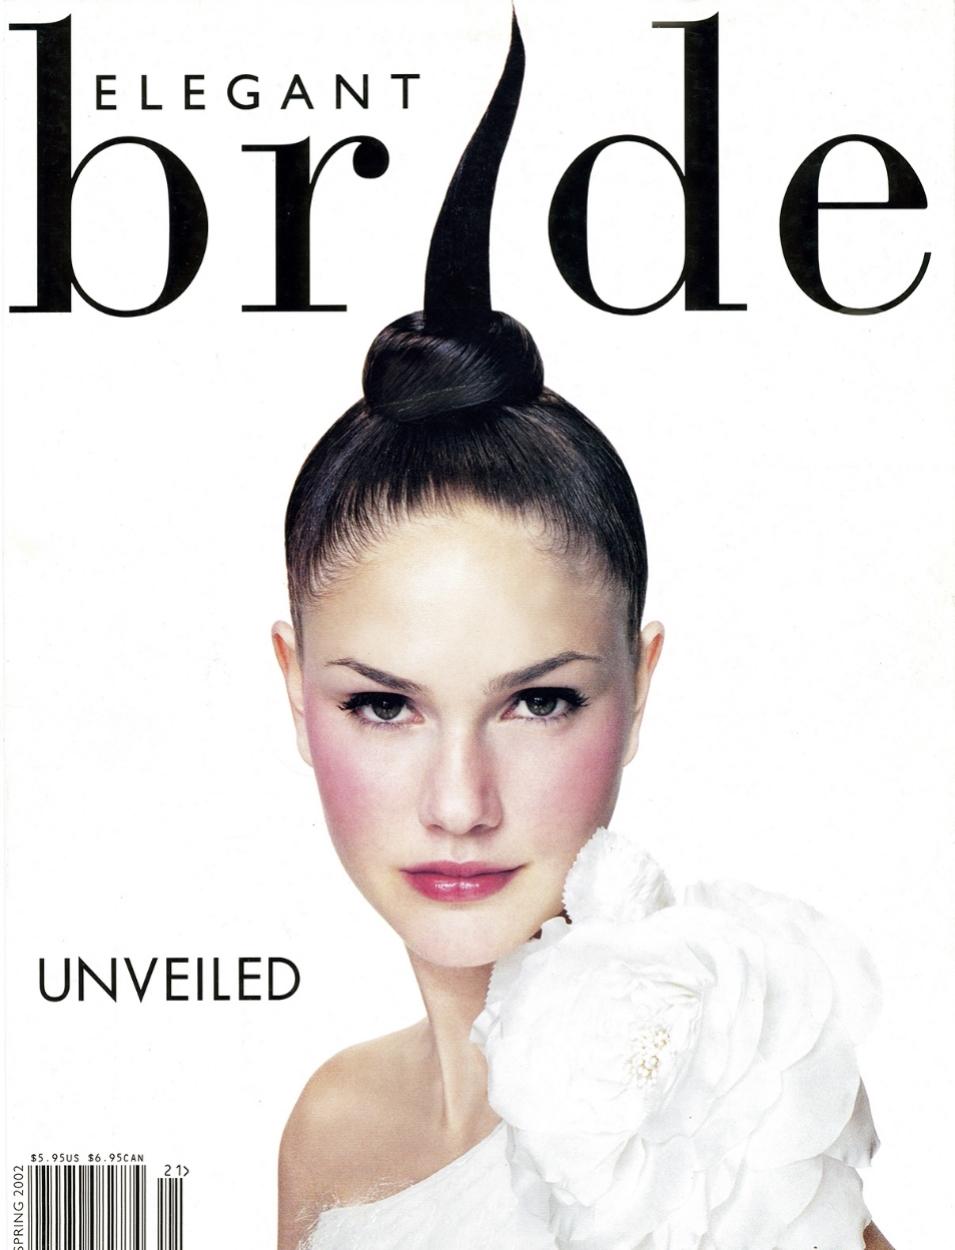 EB COVER001 copy copy copy.jpg